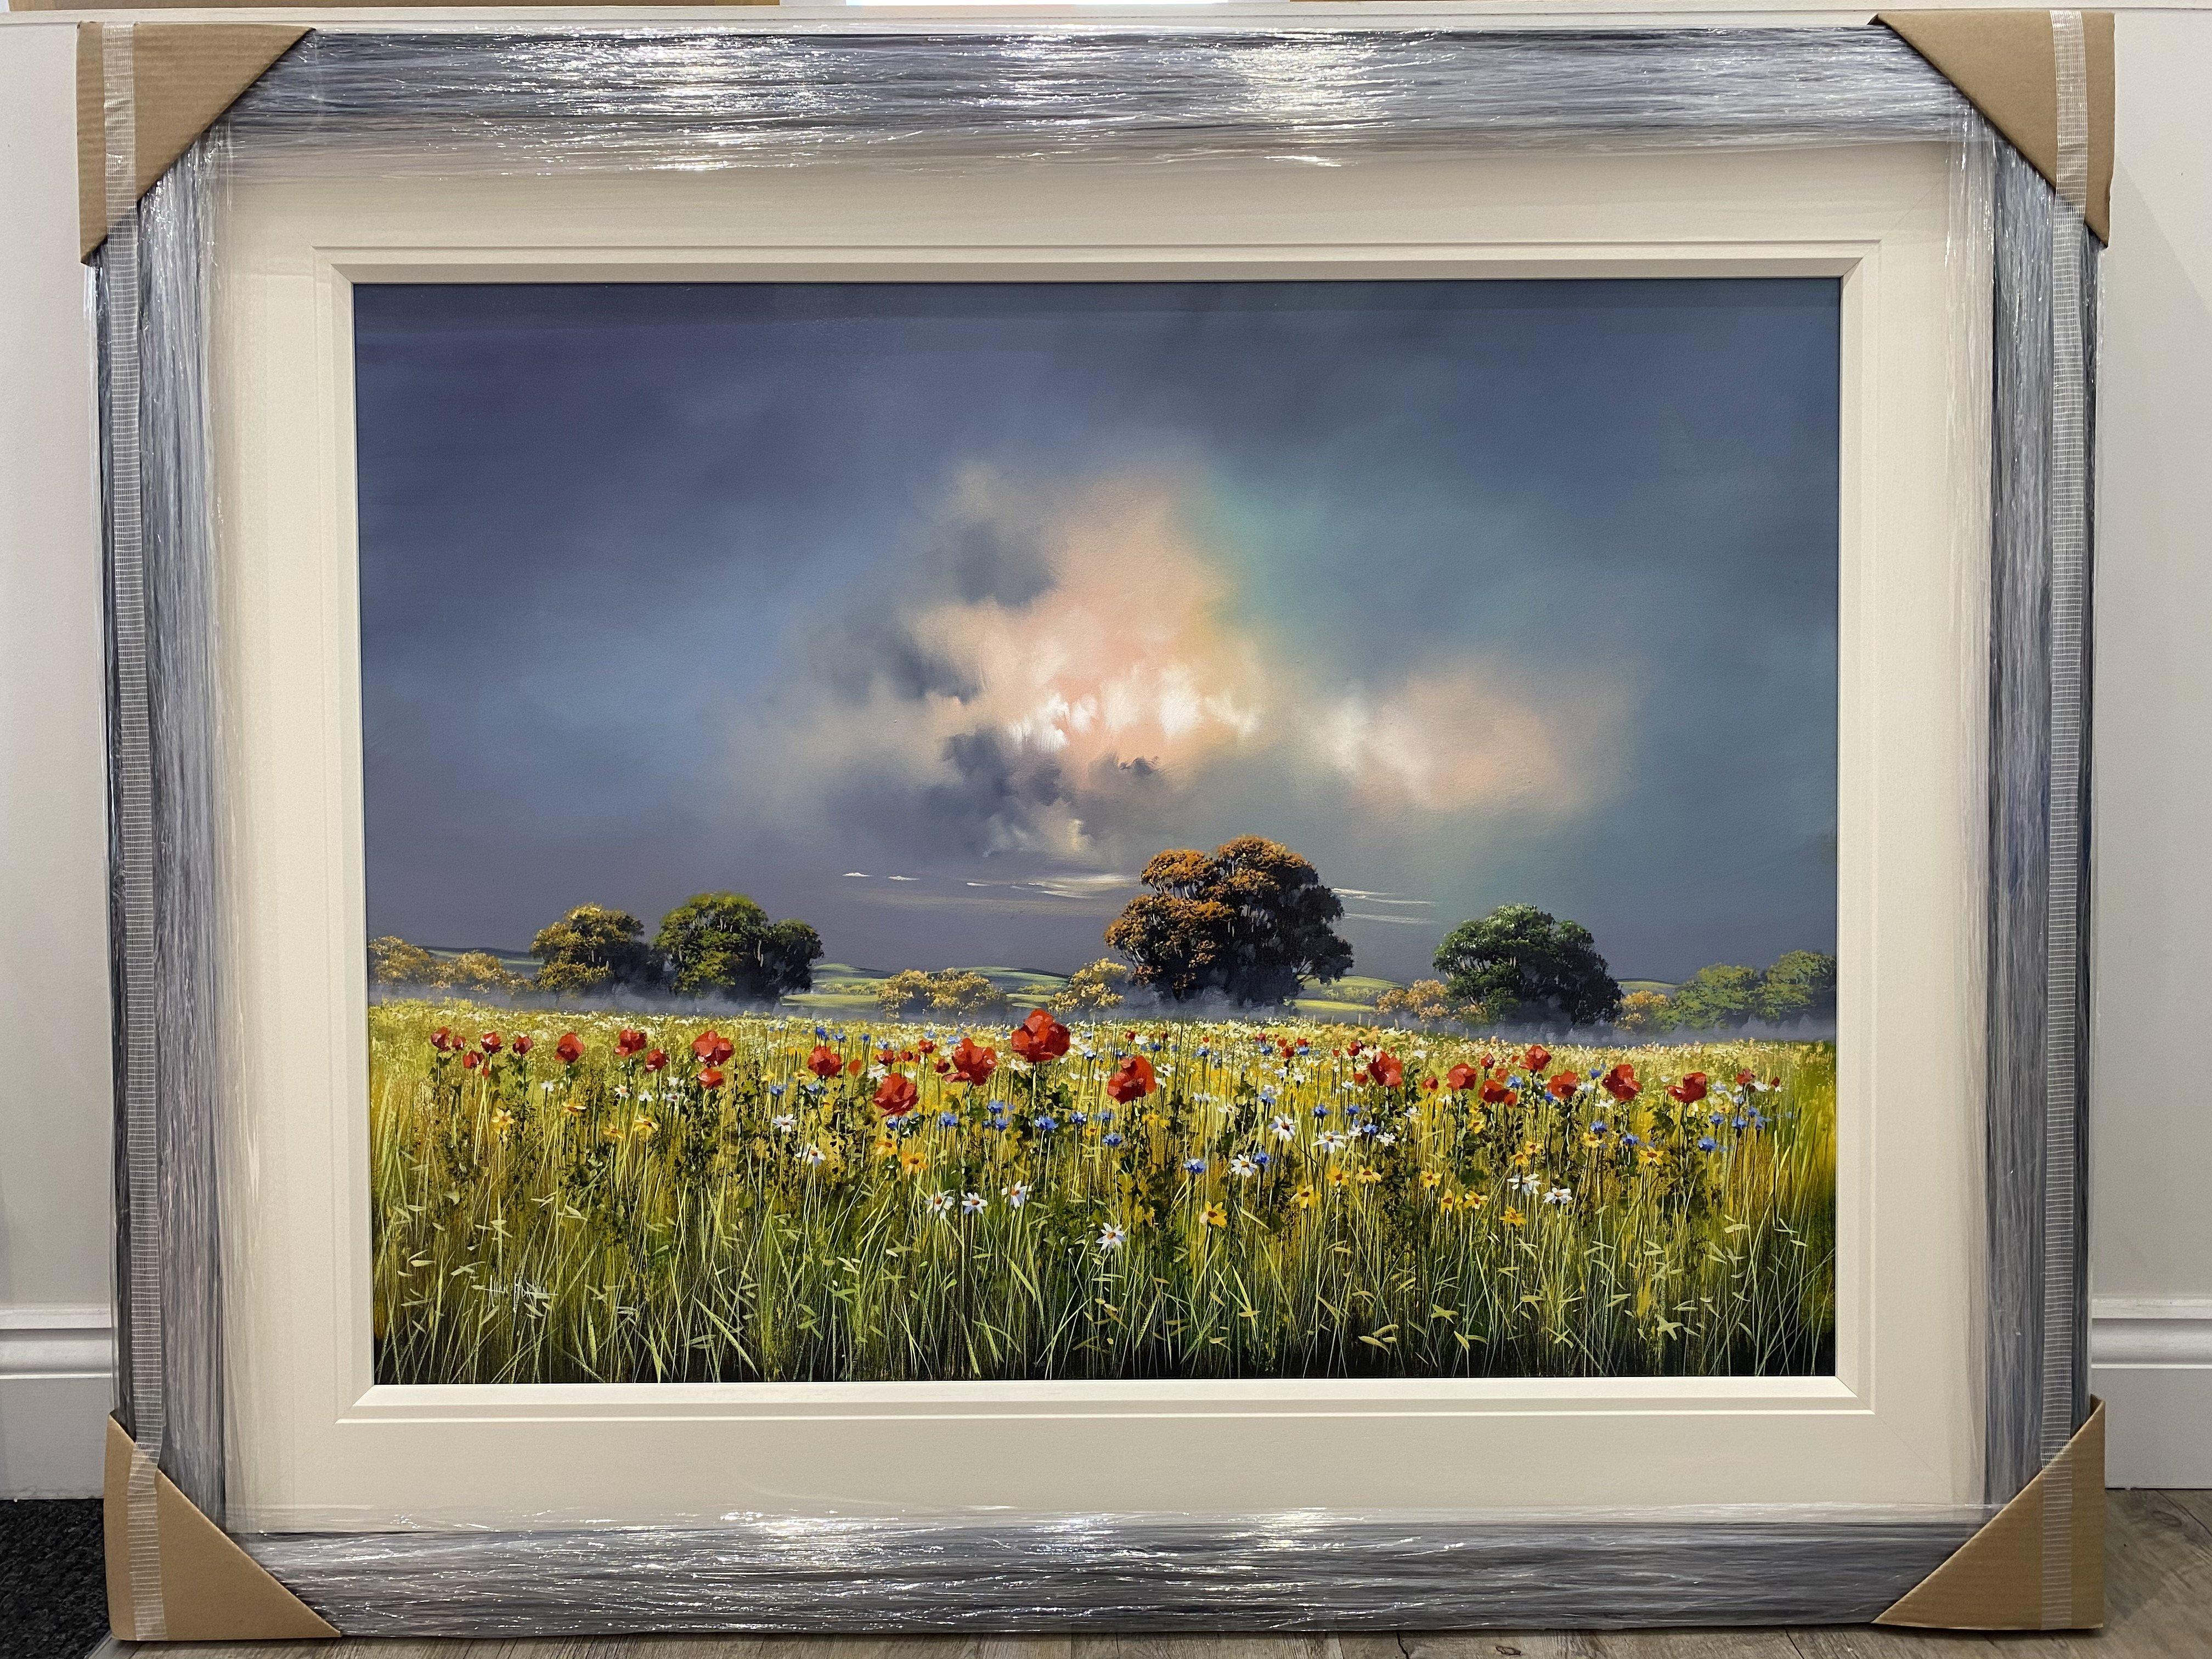 A Summers Morning by Allan Morgan